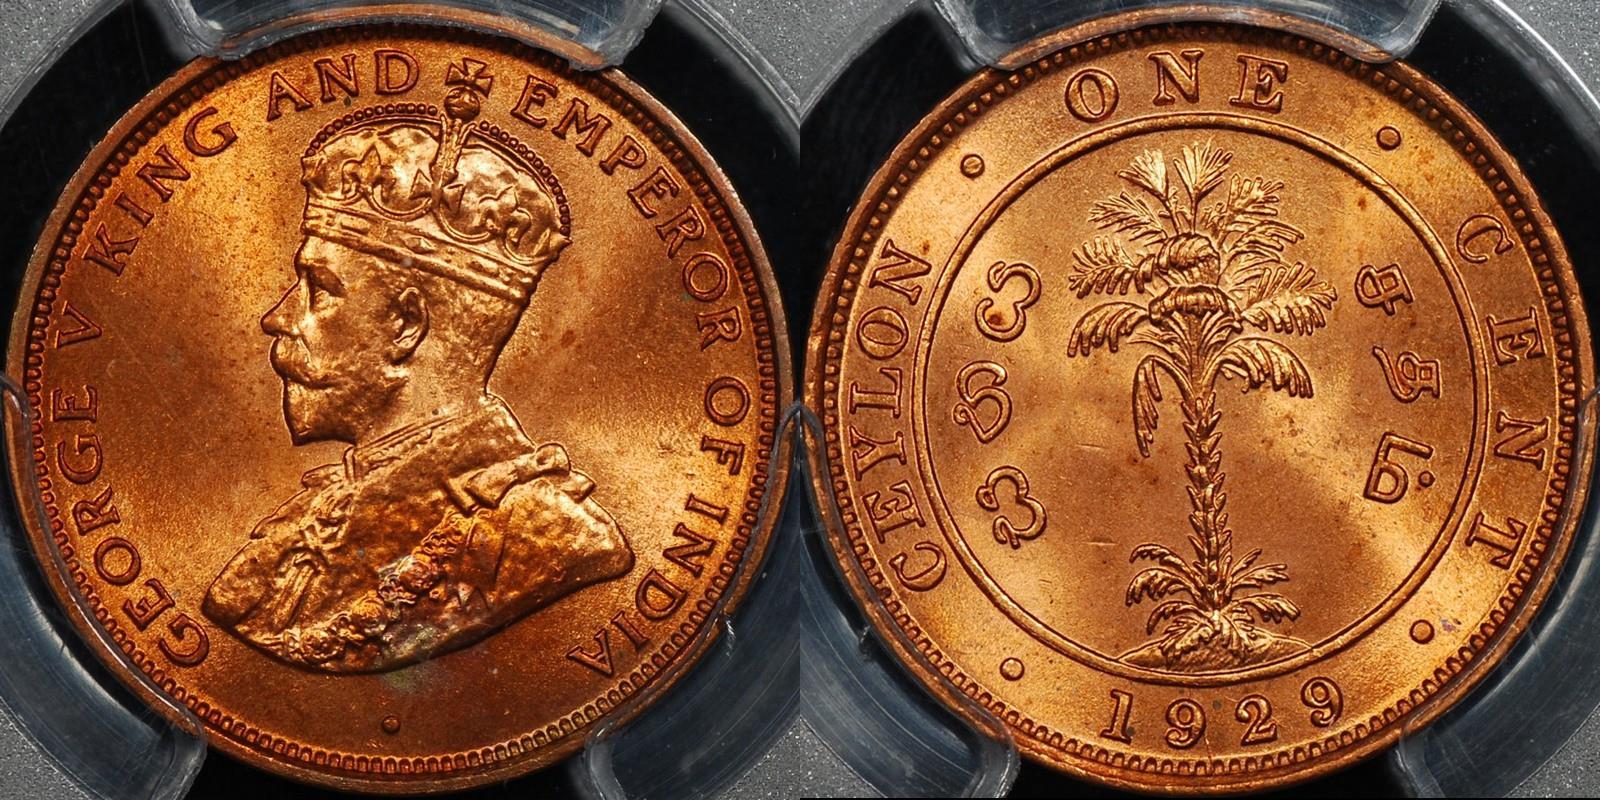 Ceylon 1929 cent km 107 PCGS MS64rd Choice Uncirculated